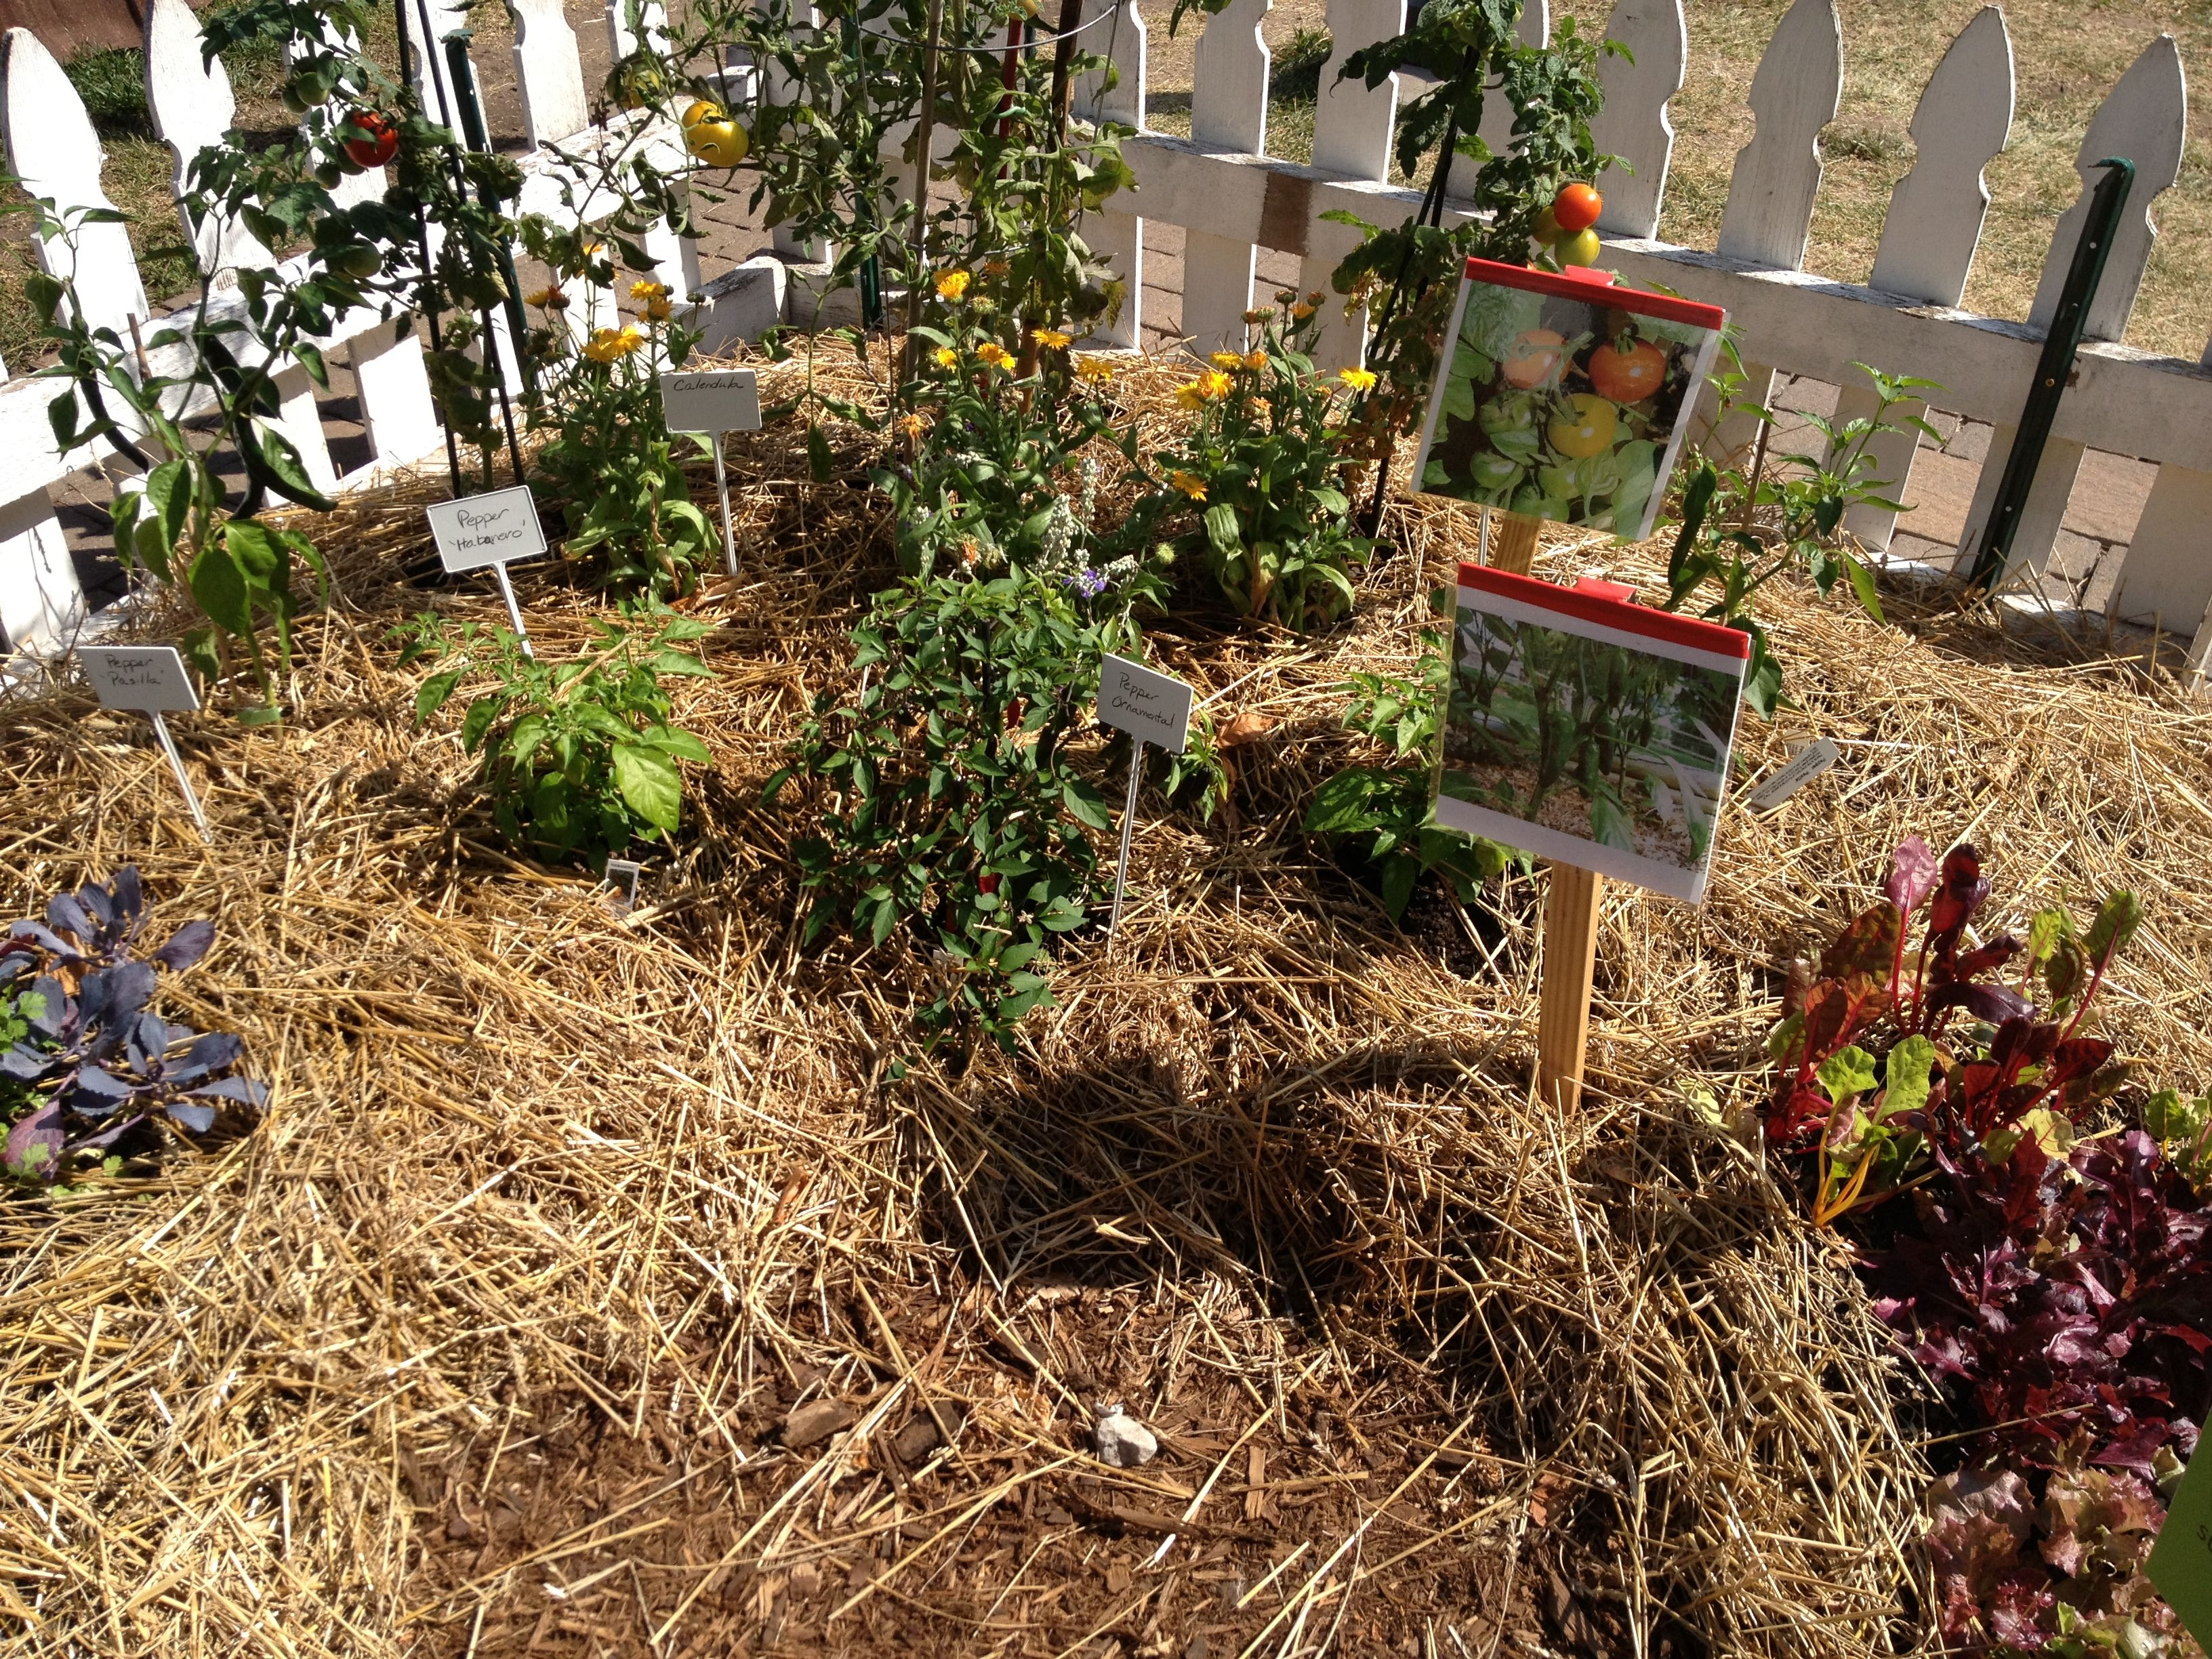 Straw bale gardening   Homesteading & Self Sufficiency   Pinterest ...